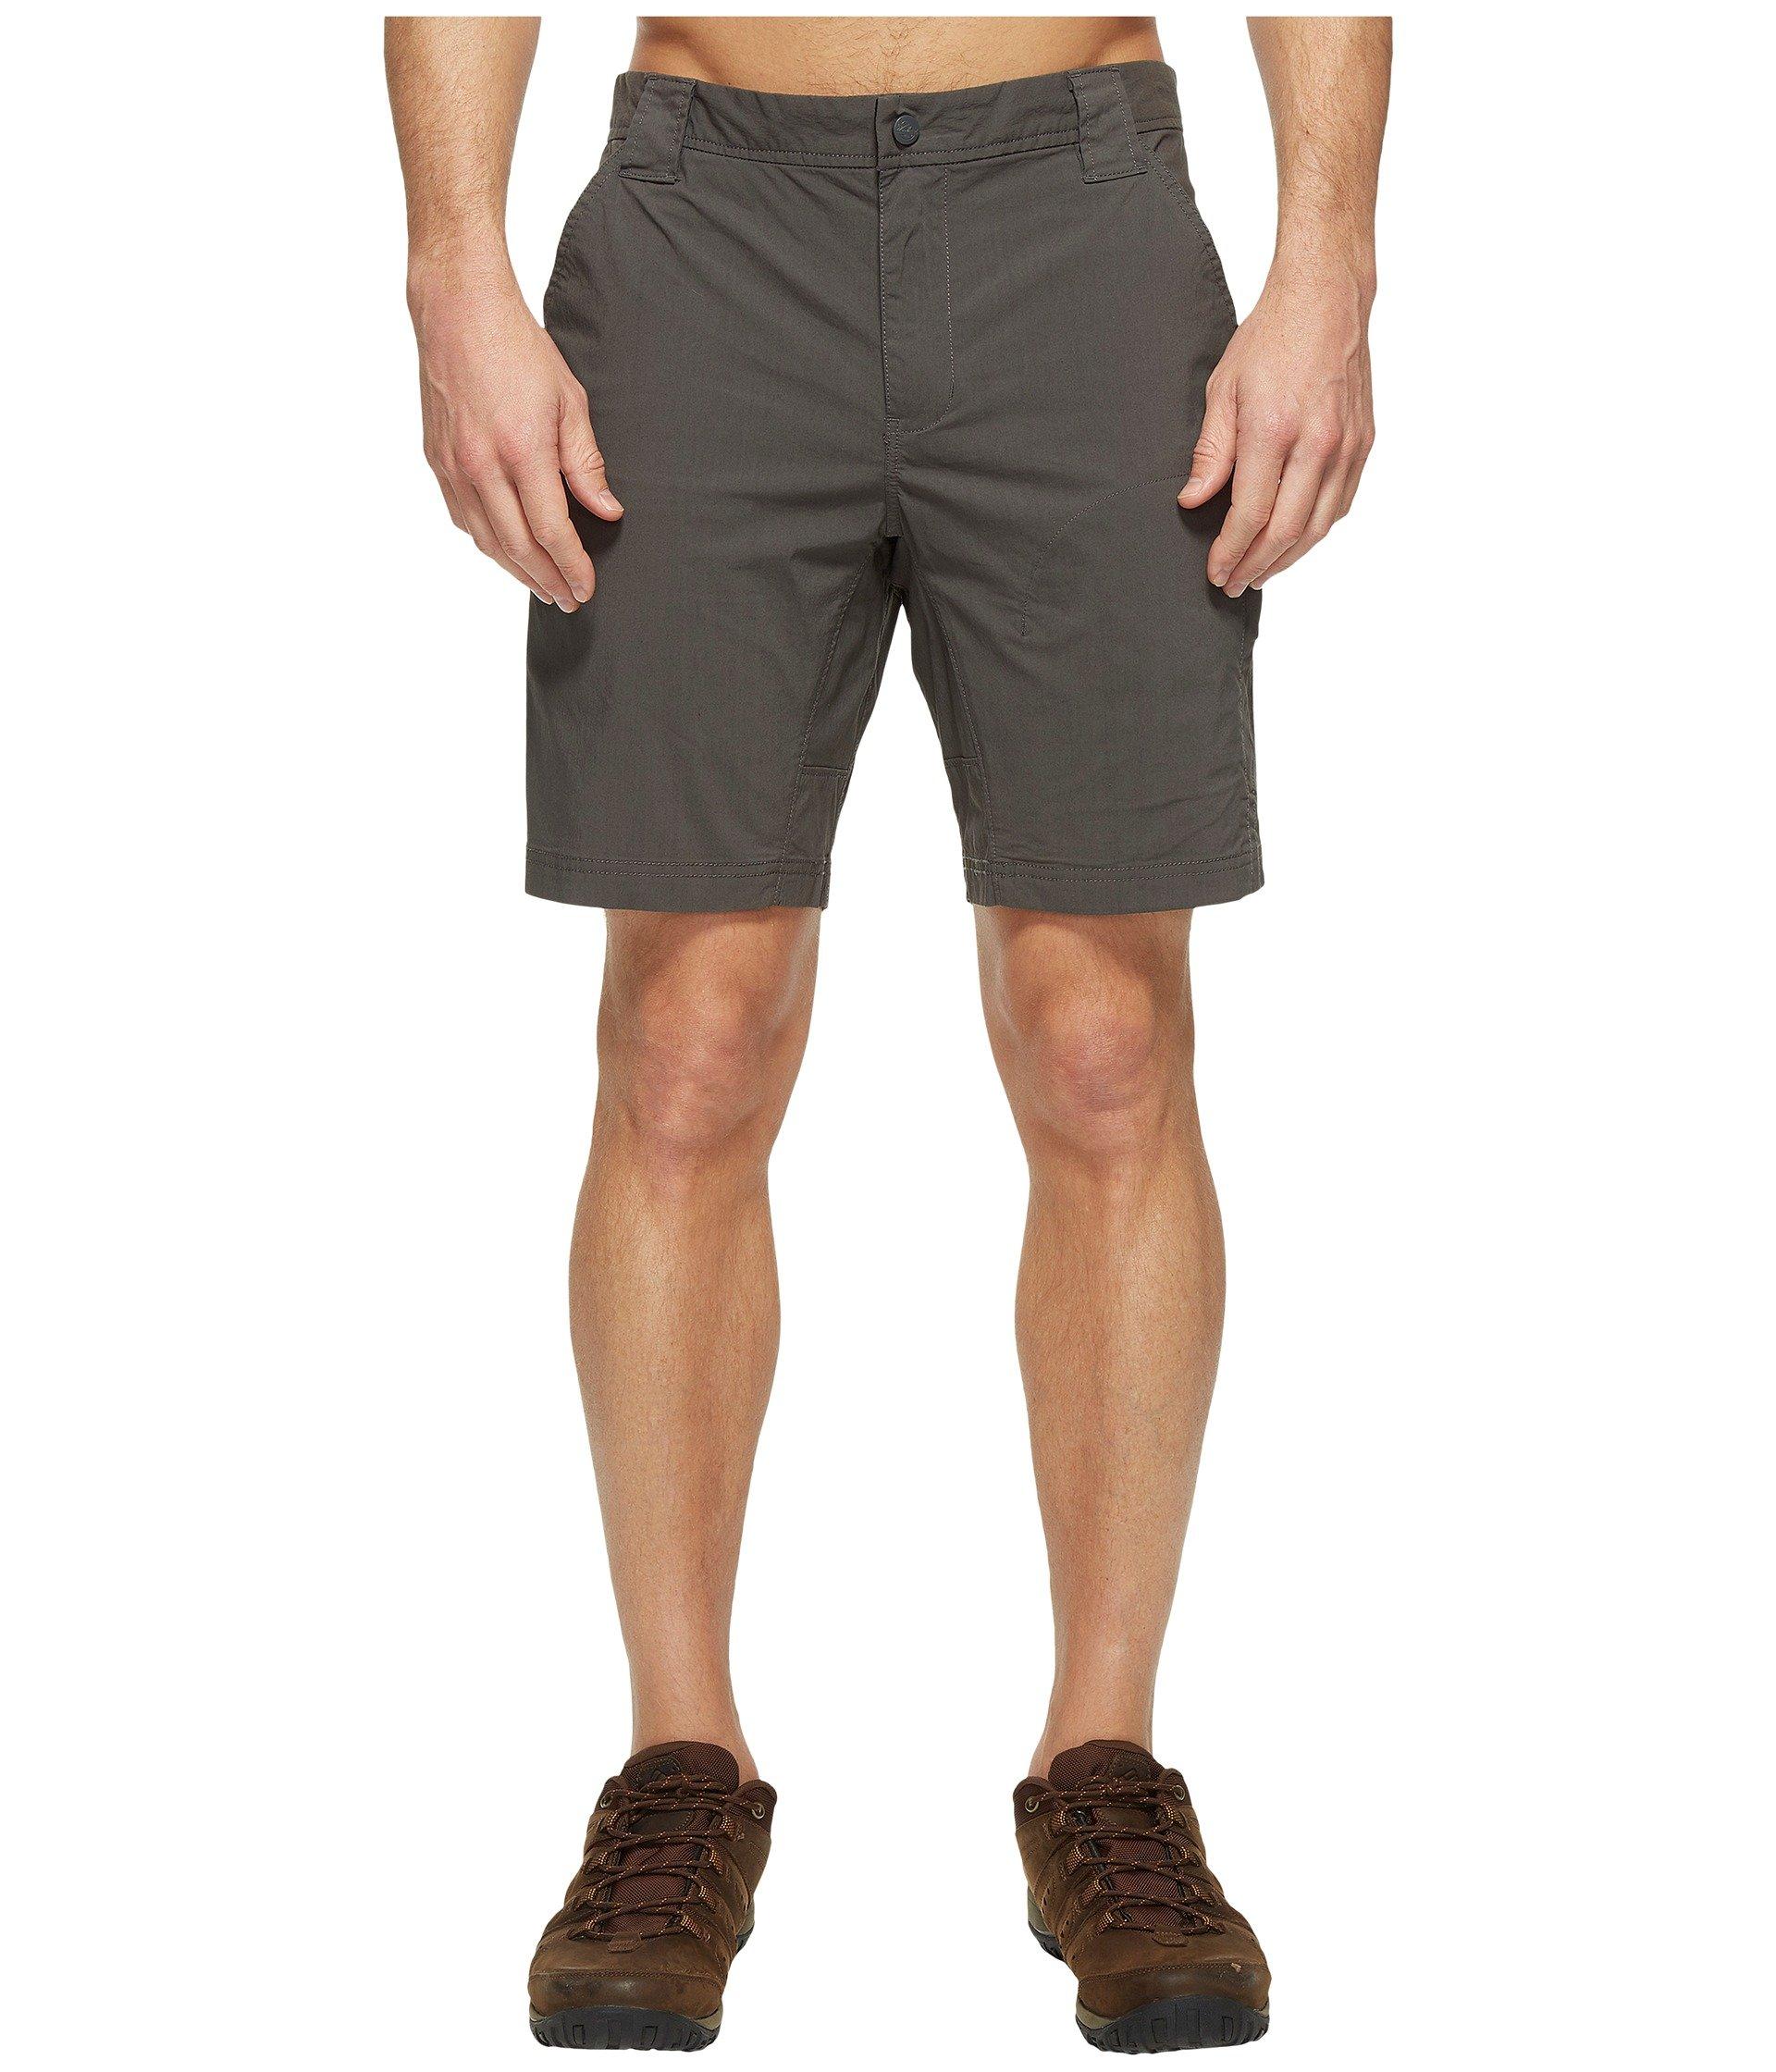 Pantaloneta para Hombre Woolrich Outdoors Shorts  + Woolrich en VeoyCompro.net